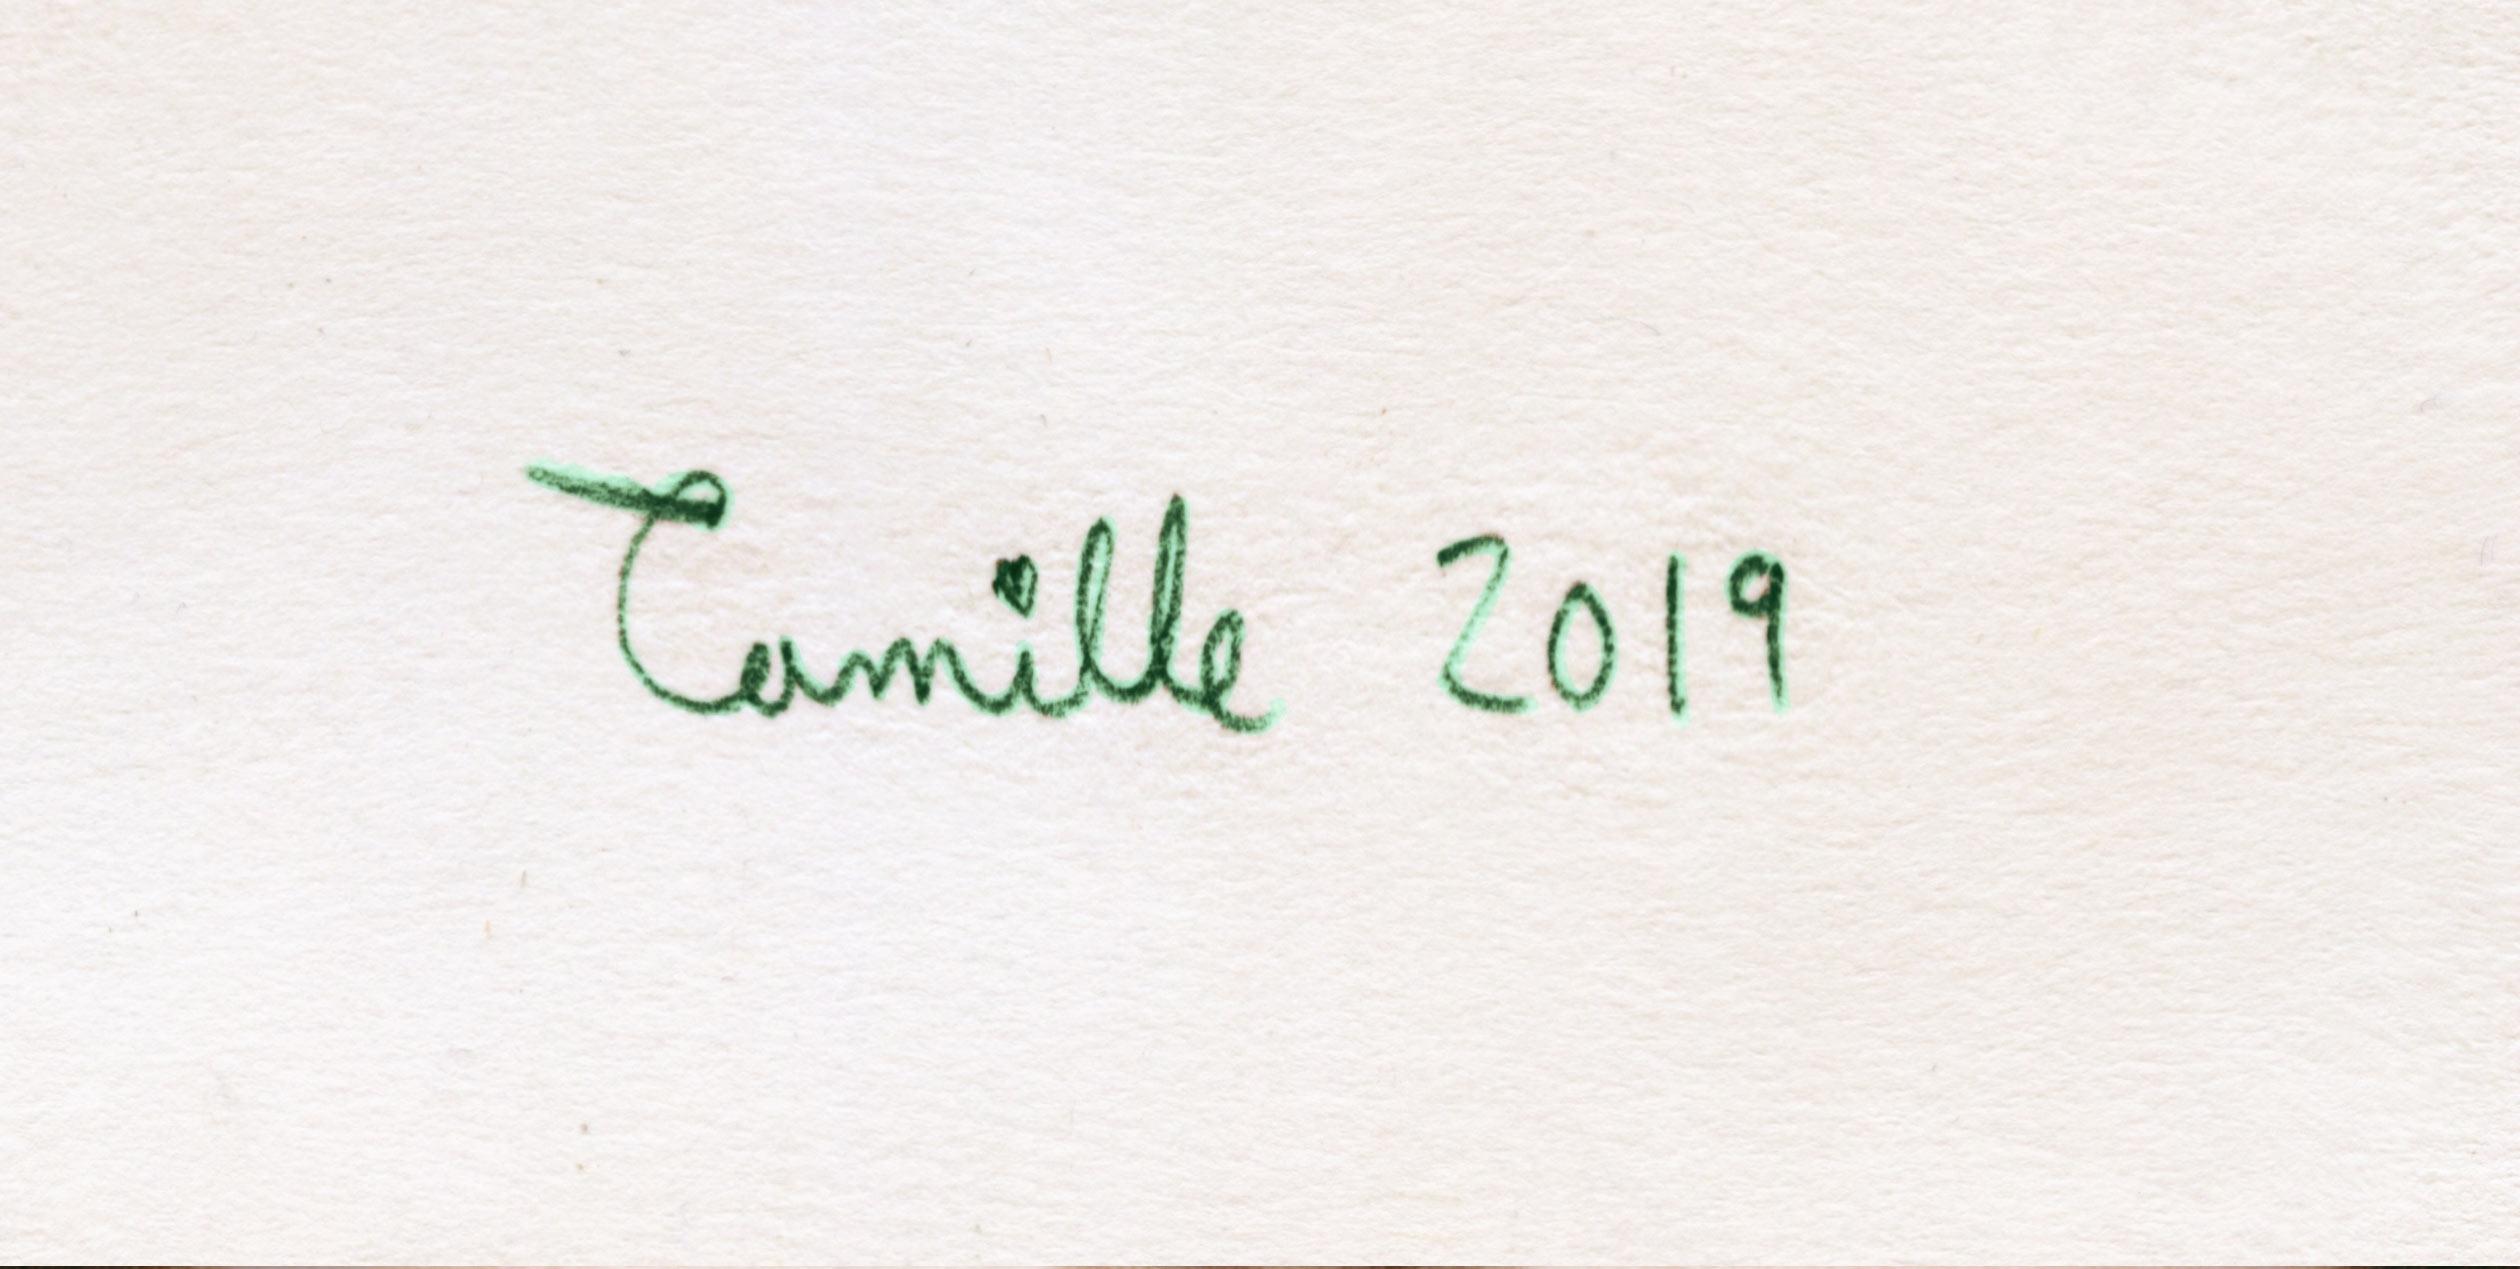 Hand writing Cursive Camille 2019